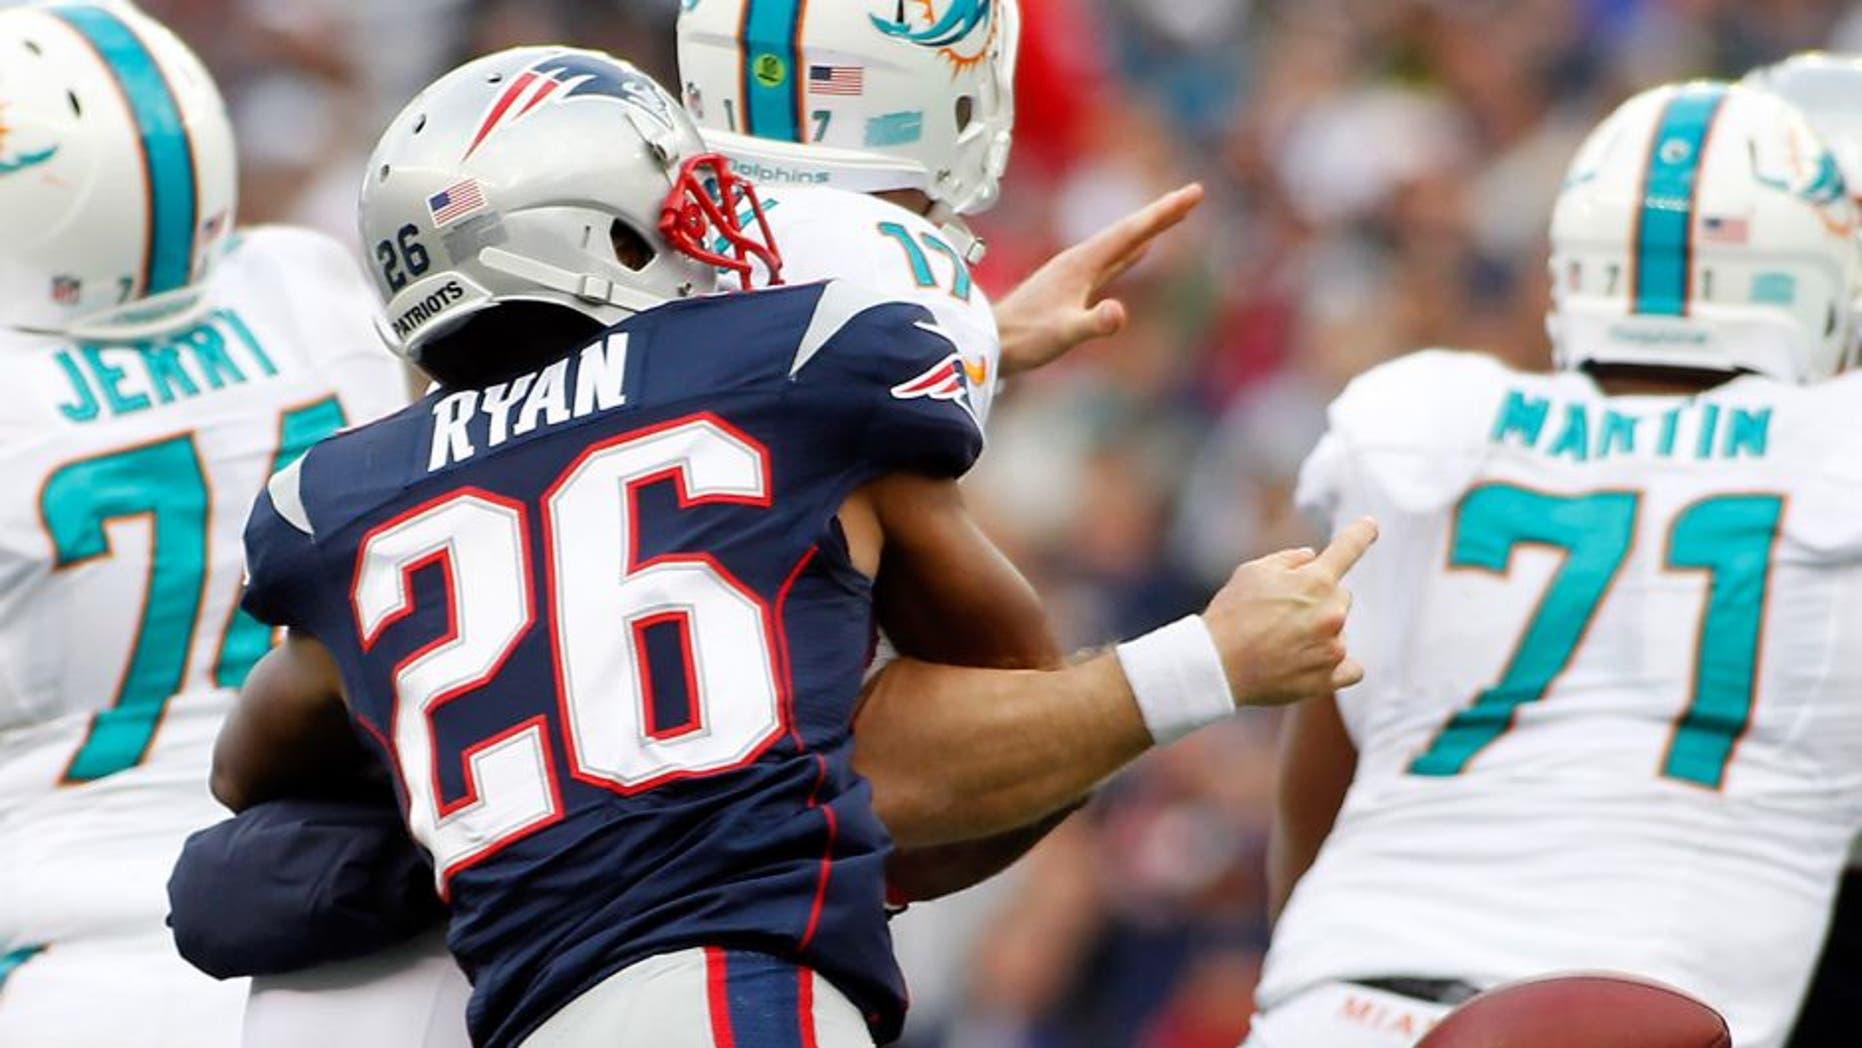 Oct 27, 2013; Foxborough, MA, USA; New England Patriots cornerback Logan Ryan (26) strip sacks Miami Dolphins quarterback Ryan Tannehill (17) during the third quarter at Gillette Stadium. Mandatory Credit: Stew Milne-USA TODAY Sports